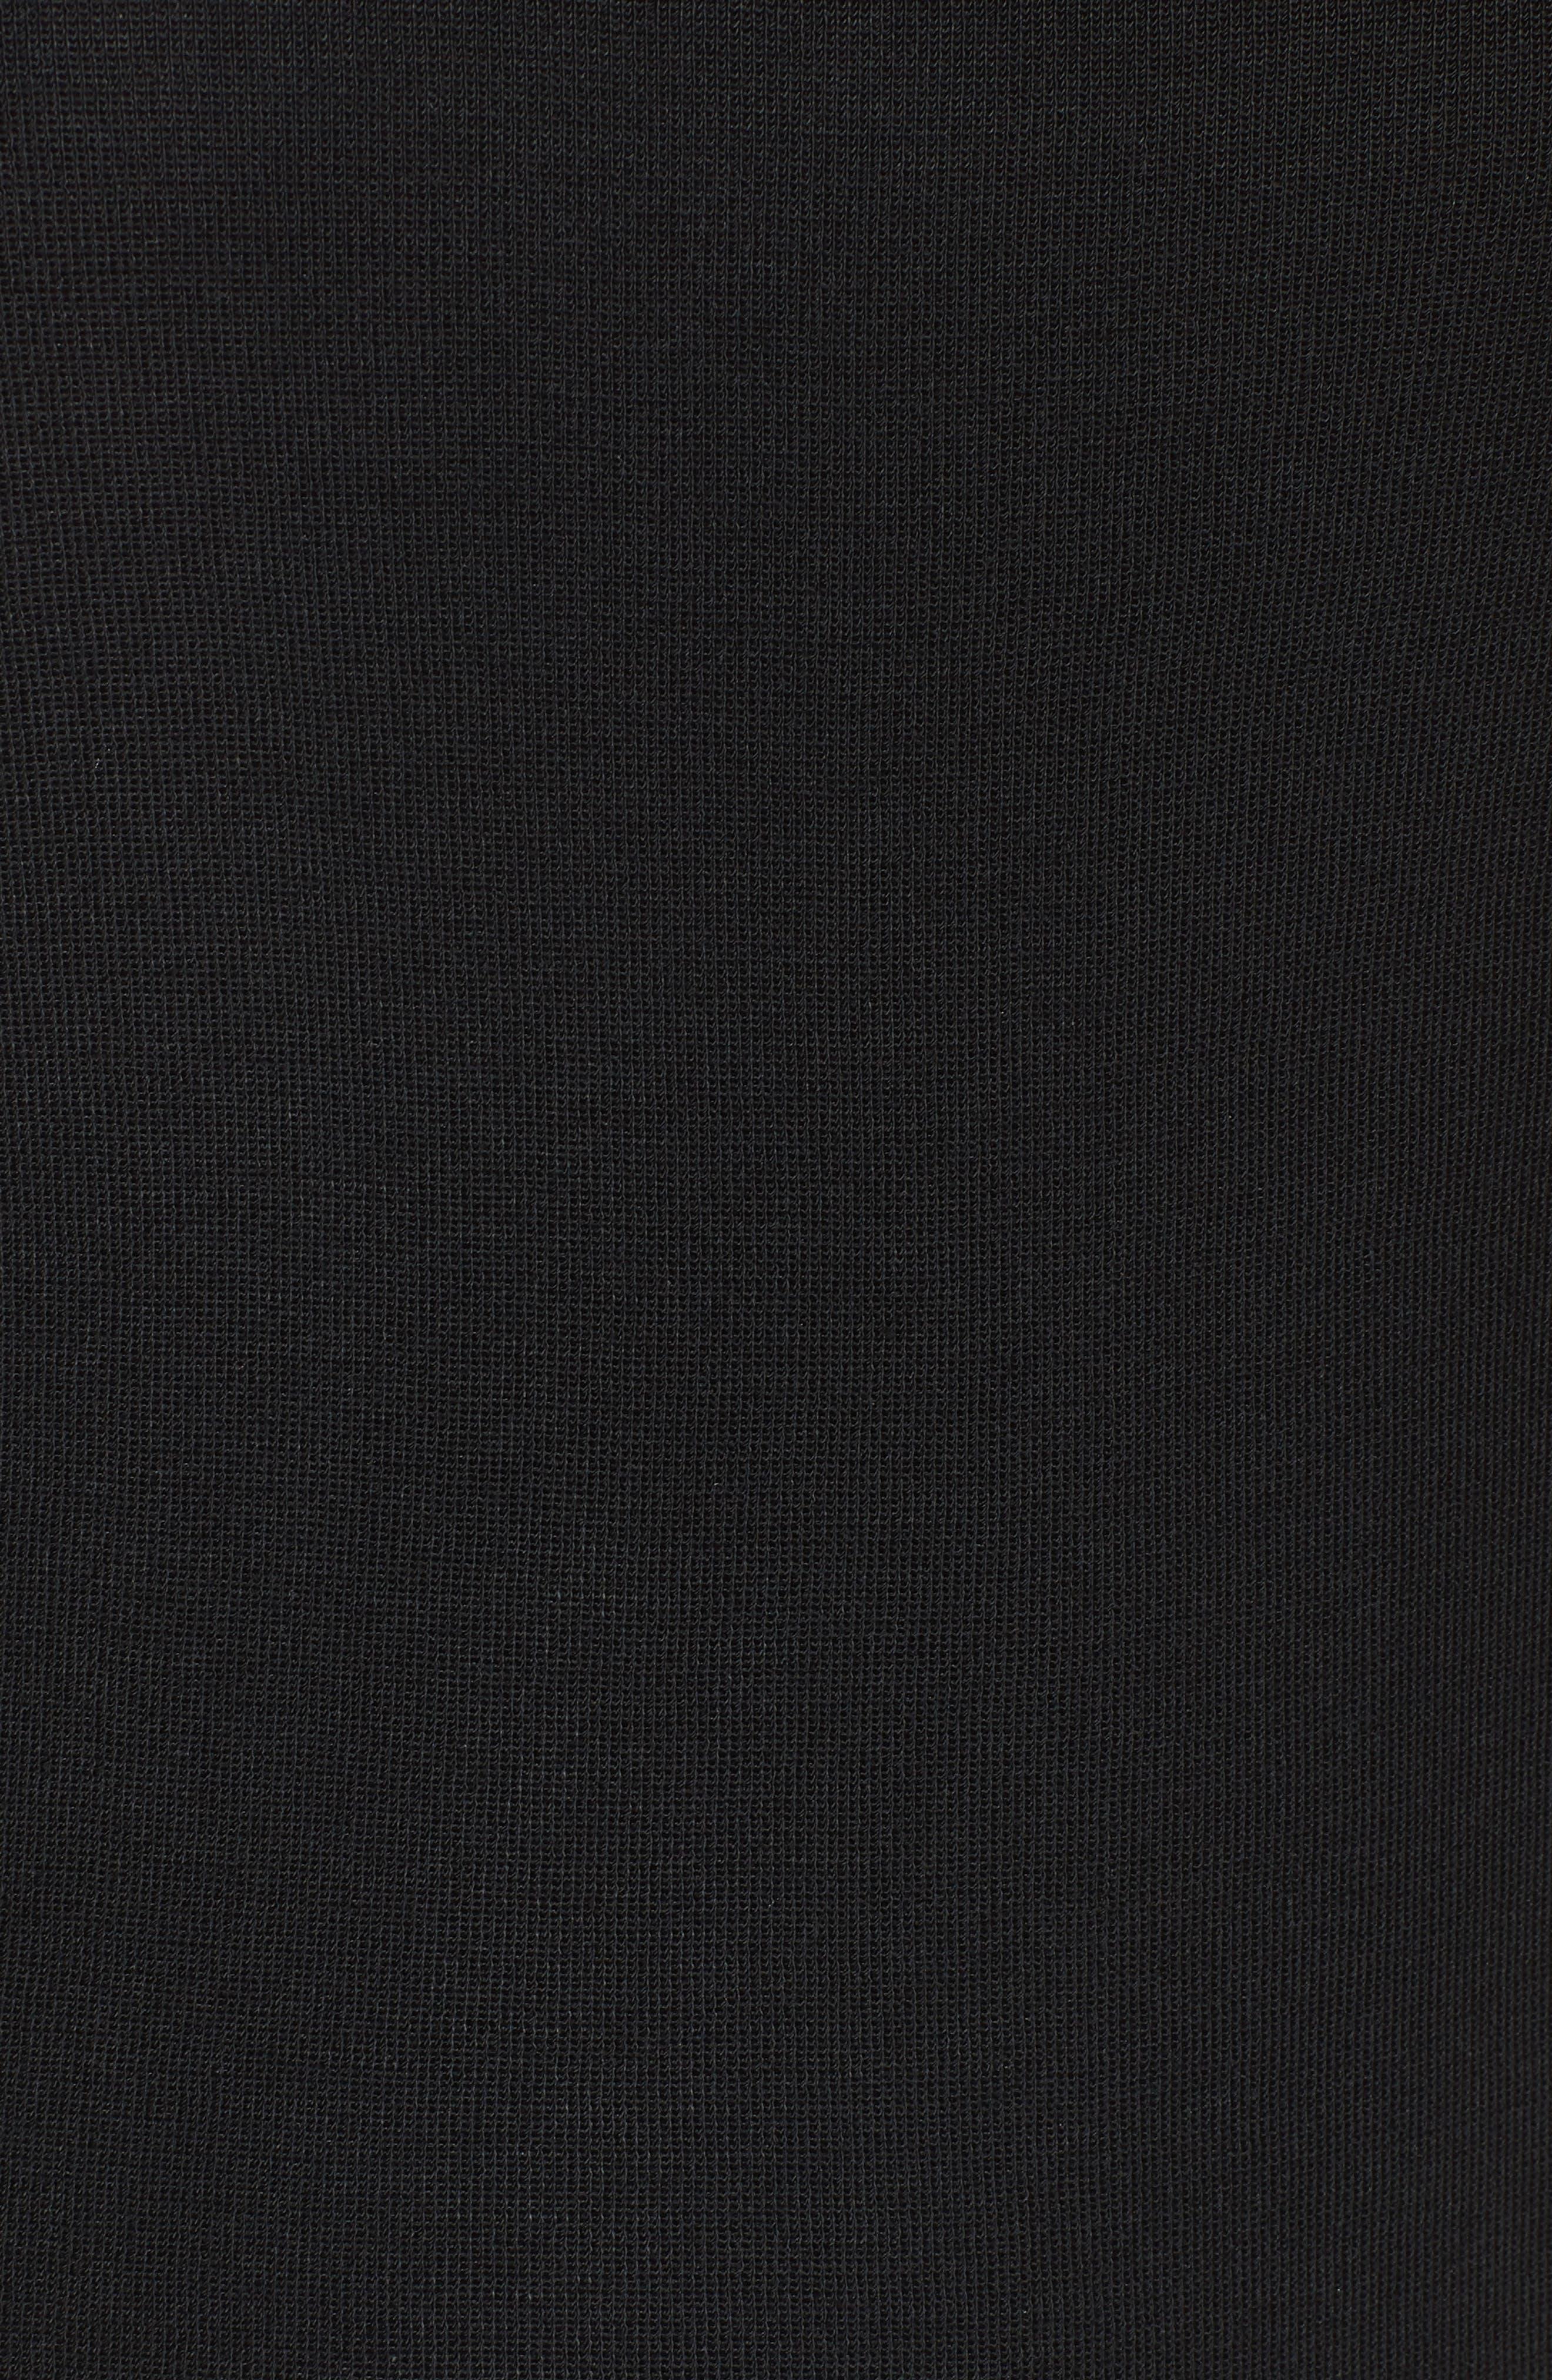 Contrast Scoop Neck Knit Tank,                             Alternate thumbnail 5, color,                             Black/ Pink Lemonade